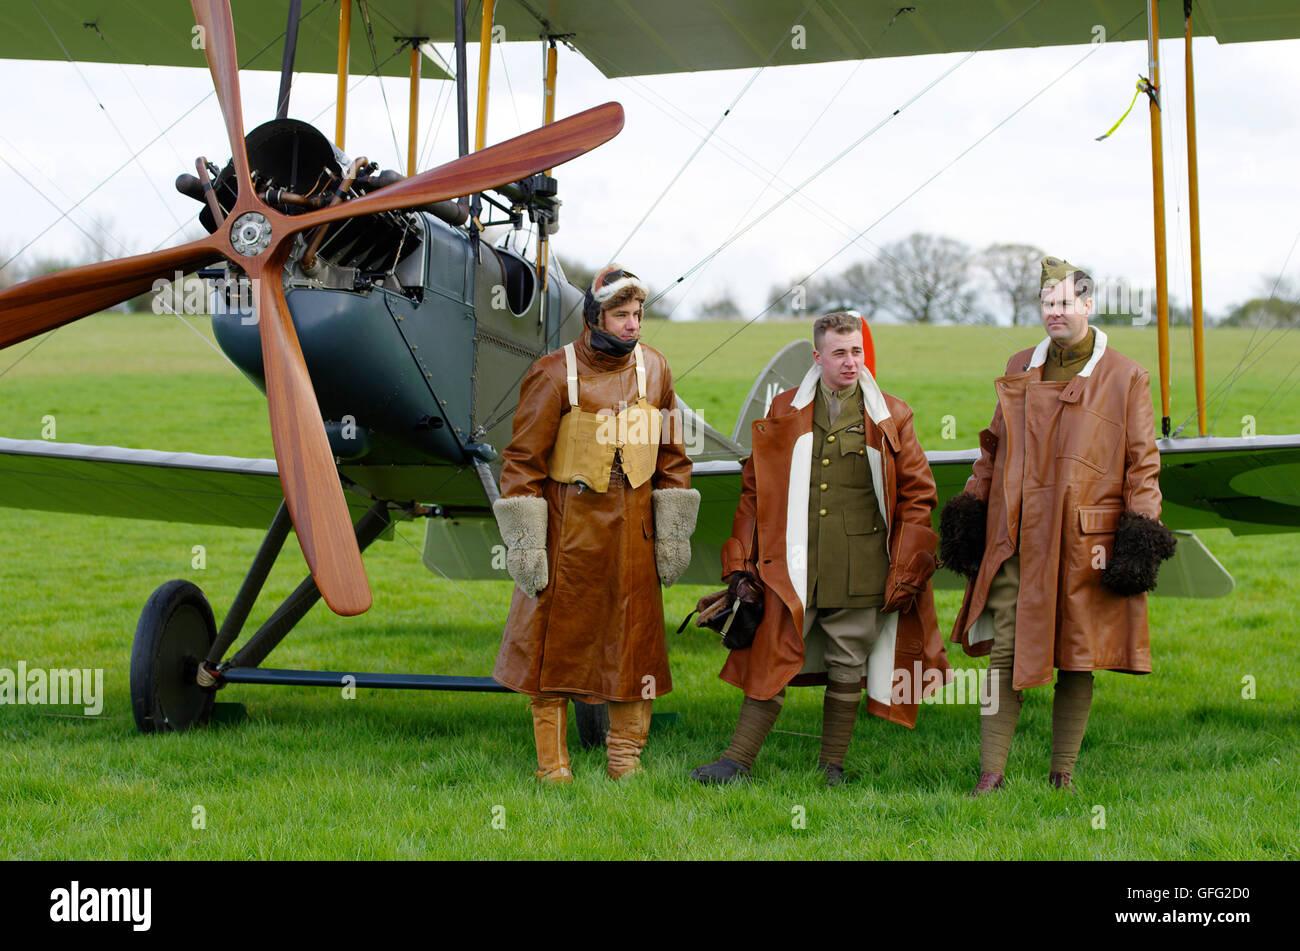 Be2e at Stow Maries Great War Aerodrome - Stock Image